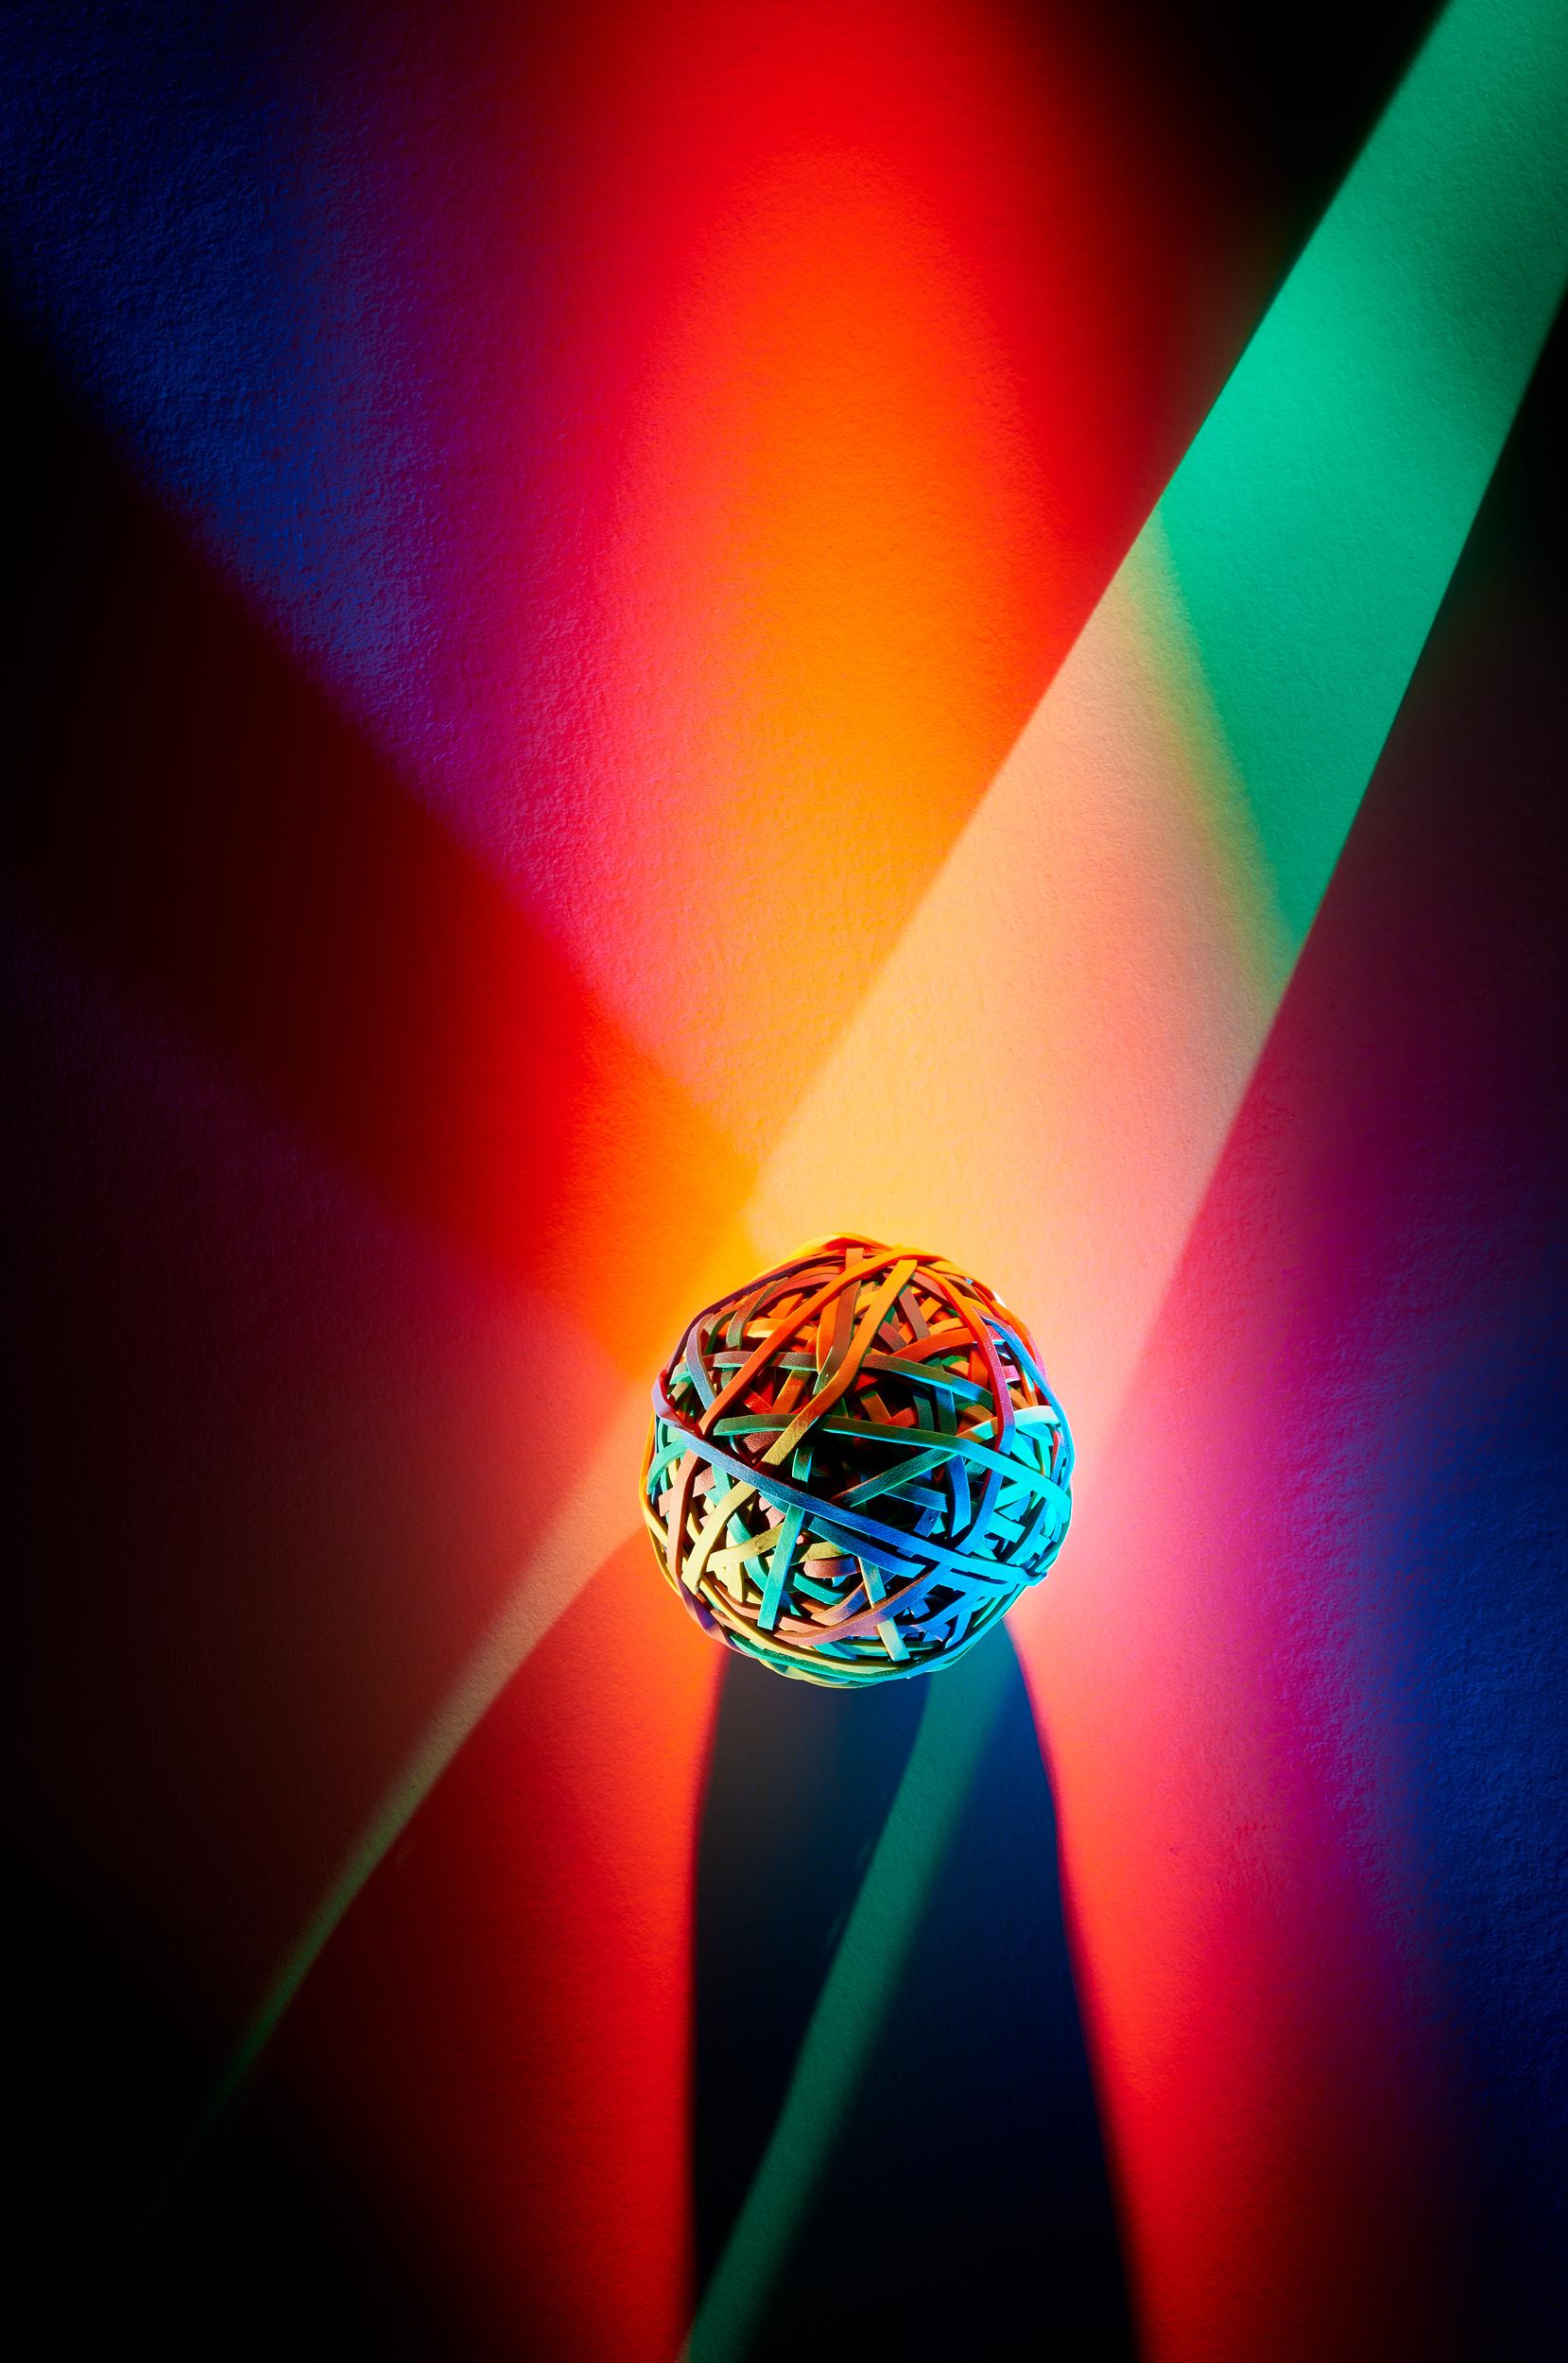 Ball, Studiofotografie, Stilllife, Still Life, Fotograf Zürich, Schweiz